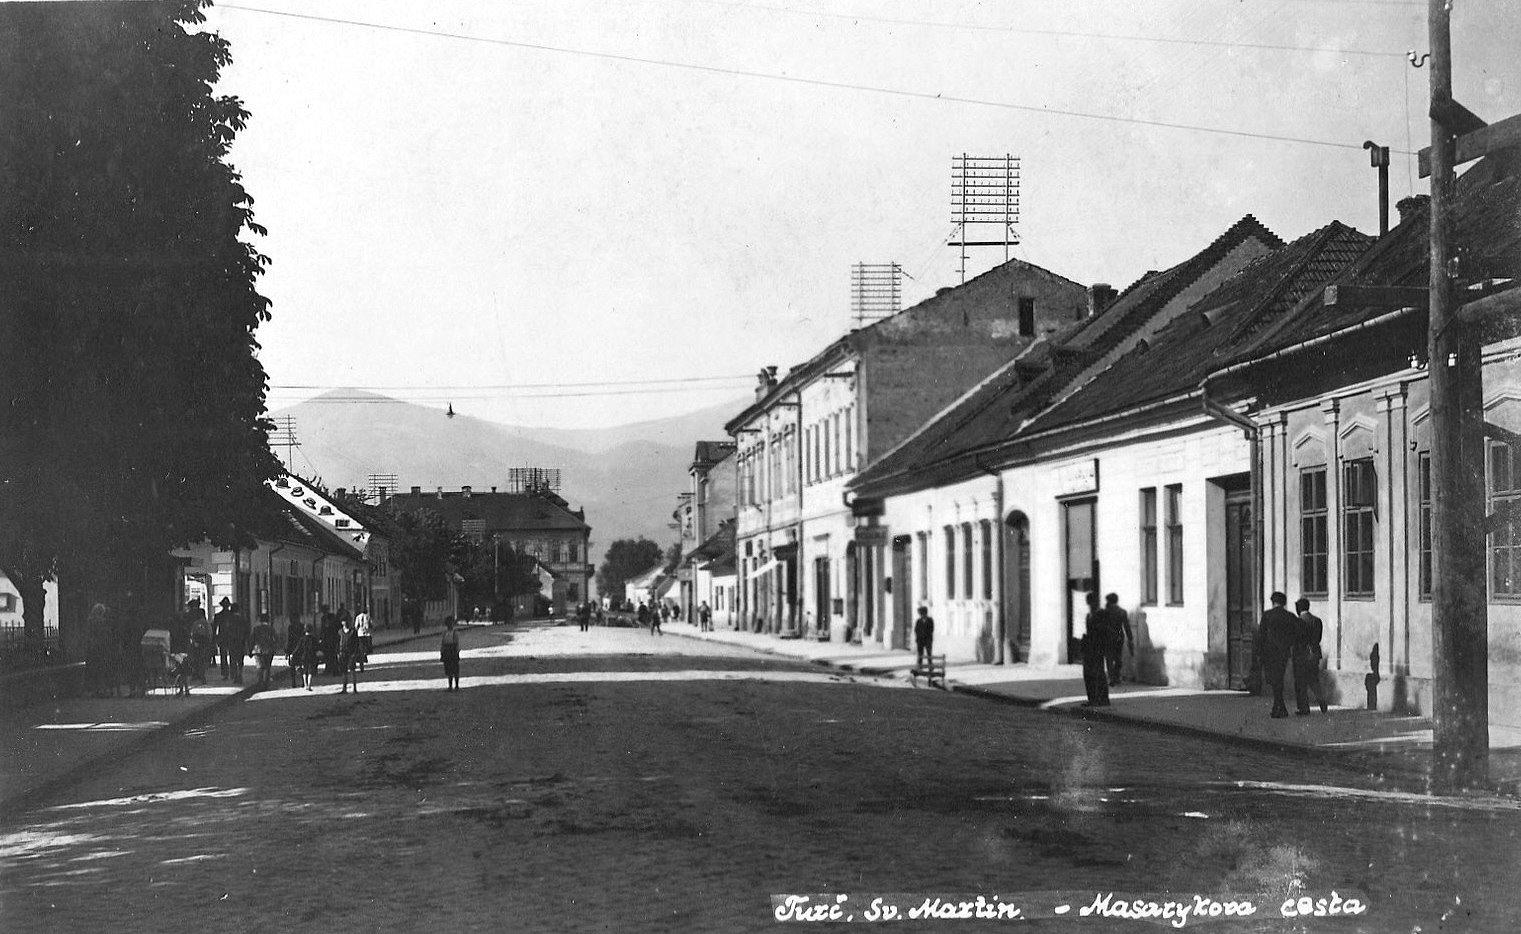 Masarykova cesta, 30te roky